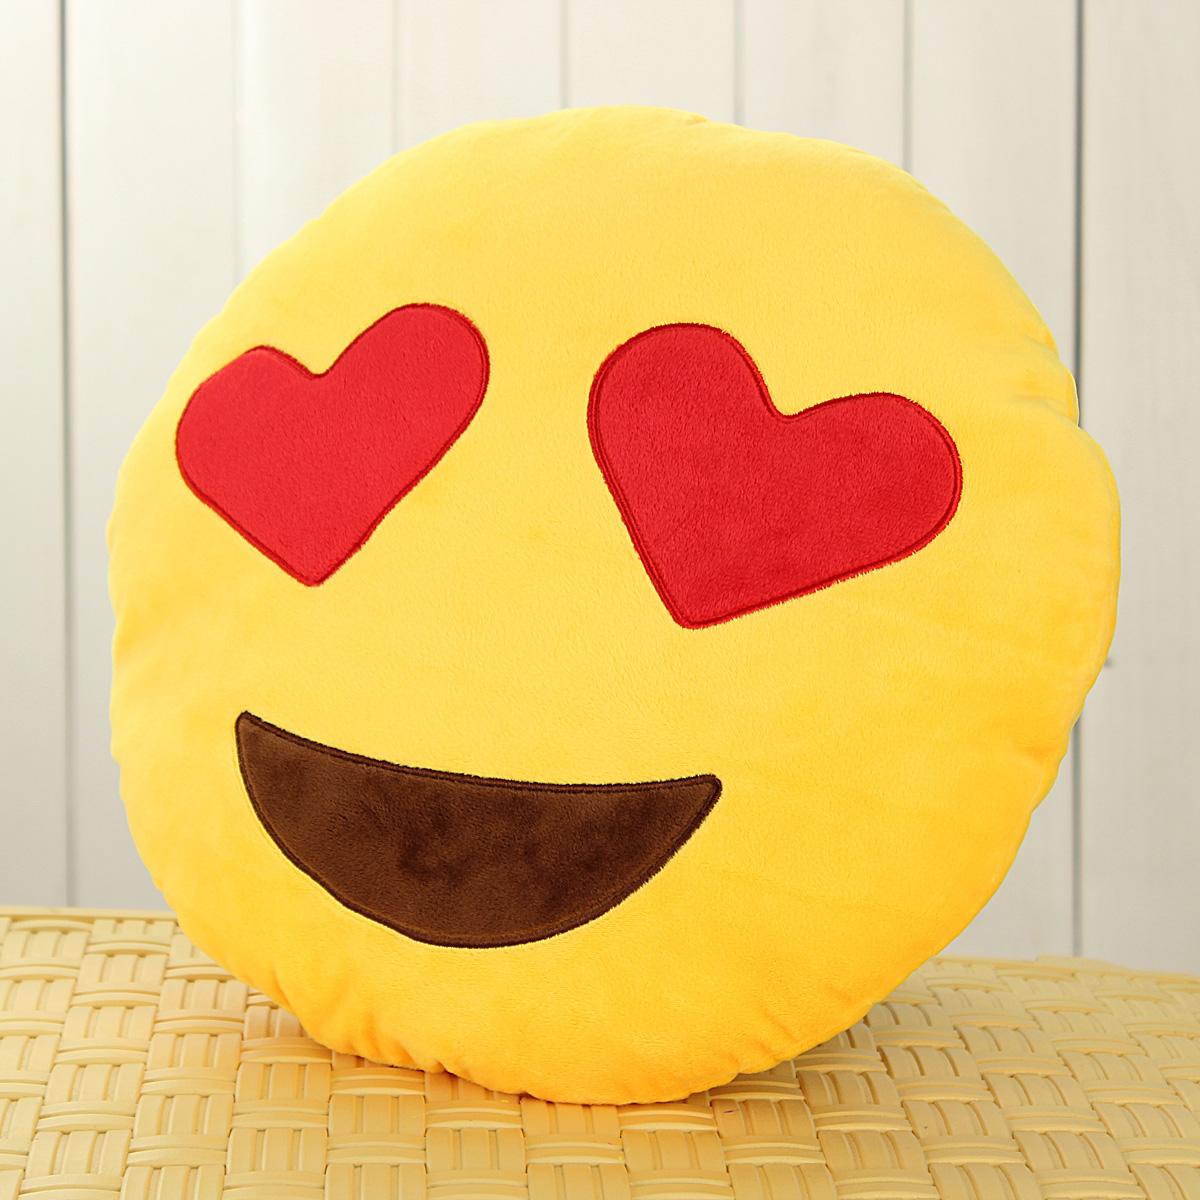 Coussin Rond Jaune Oreiller Emoji Peluche Poup233e Smiley  : CA2303CECB03C803C85BCE63CF8323C87343F333F563 from ebay.fr size 1200 x 1200 jpeg 402kB